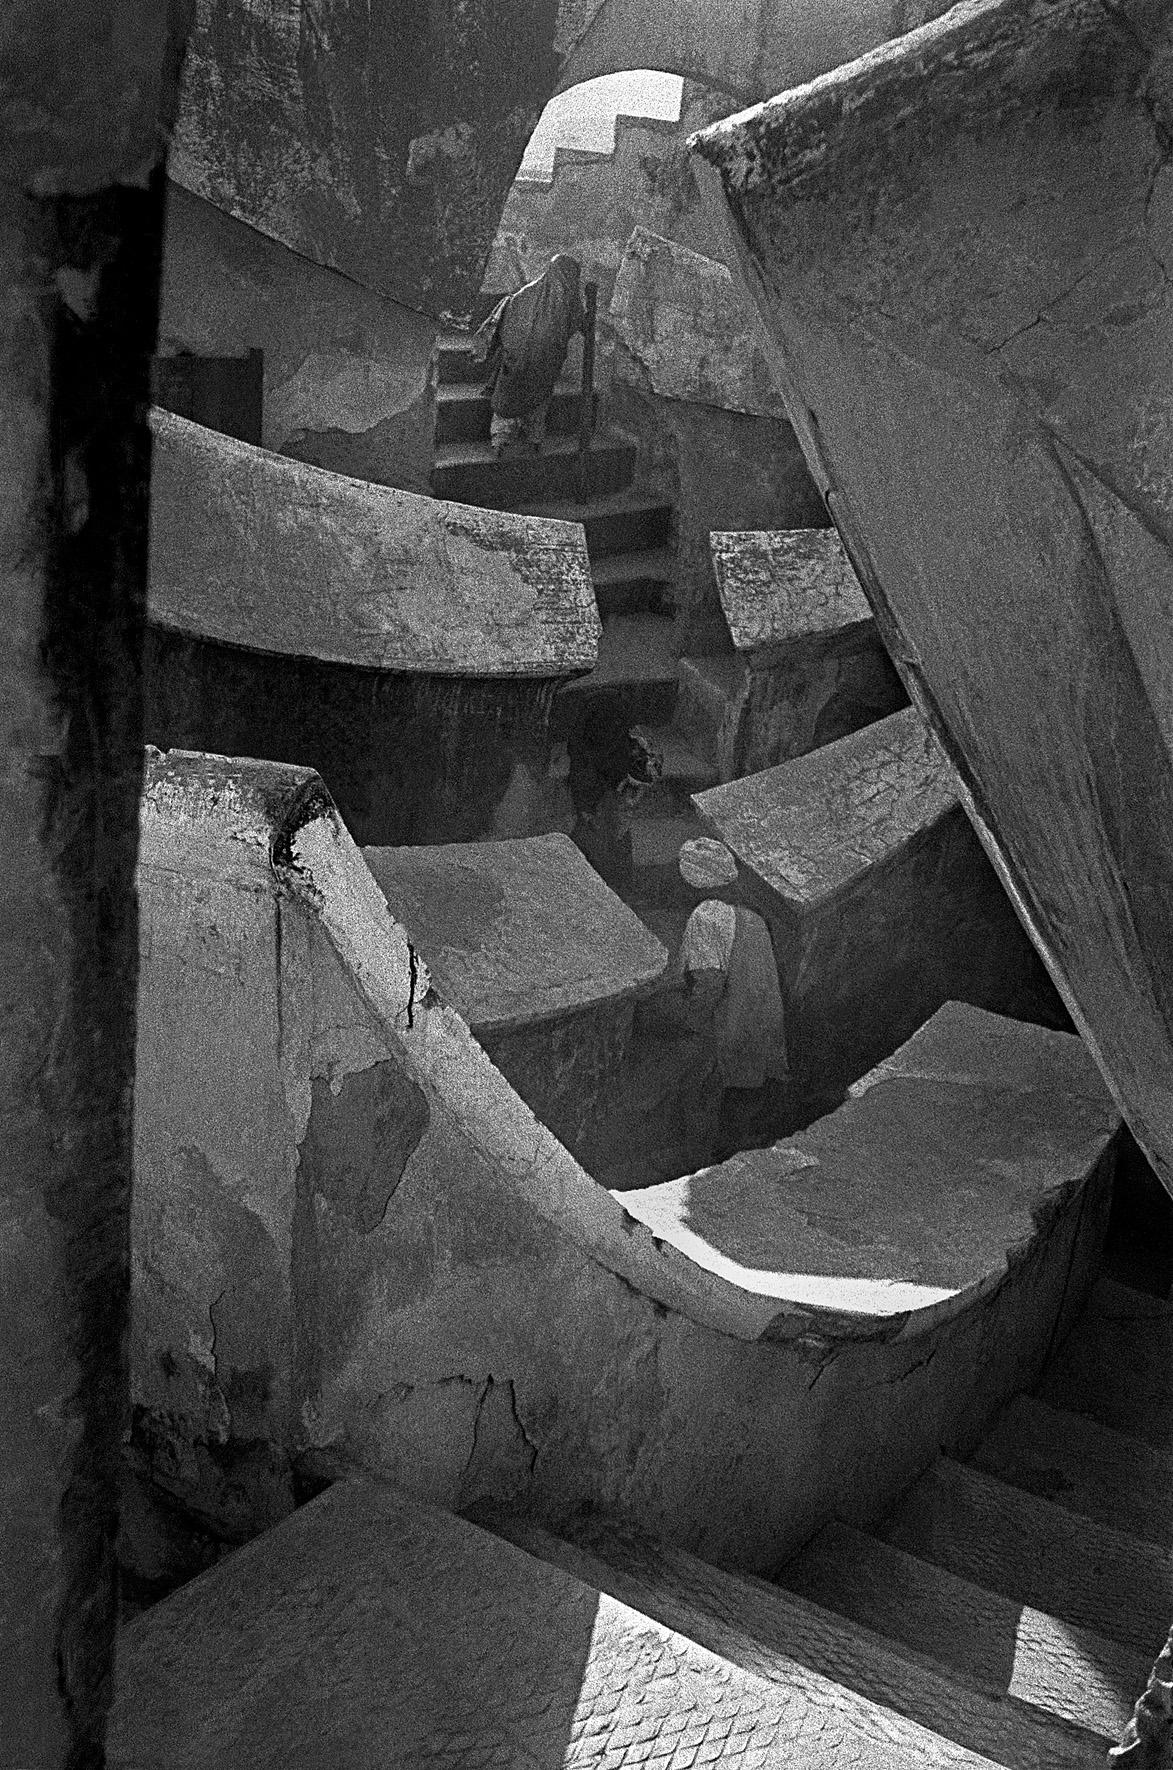 © Frank Horvat - Jantar Mantar (astronomical instruments), India, 1952, Courtesy KLV Art Projects